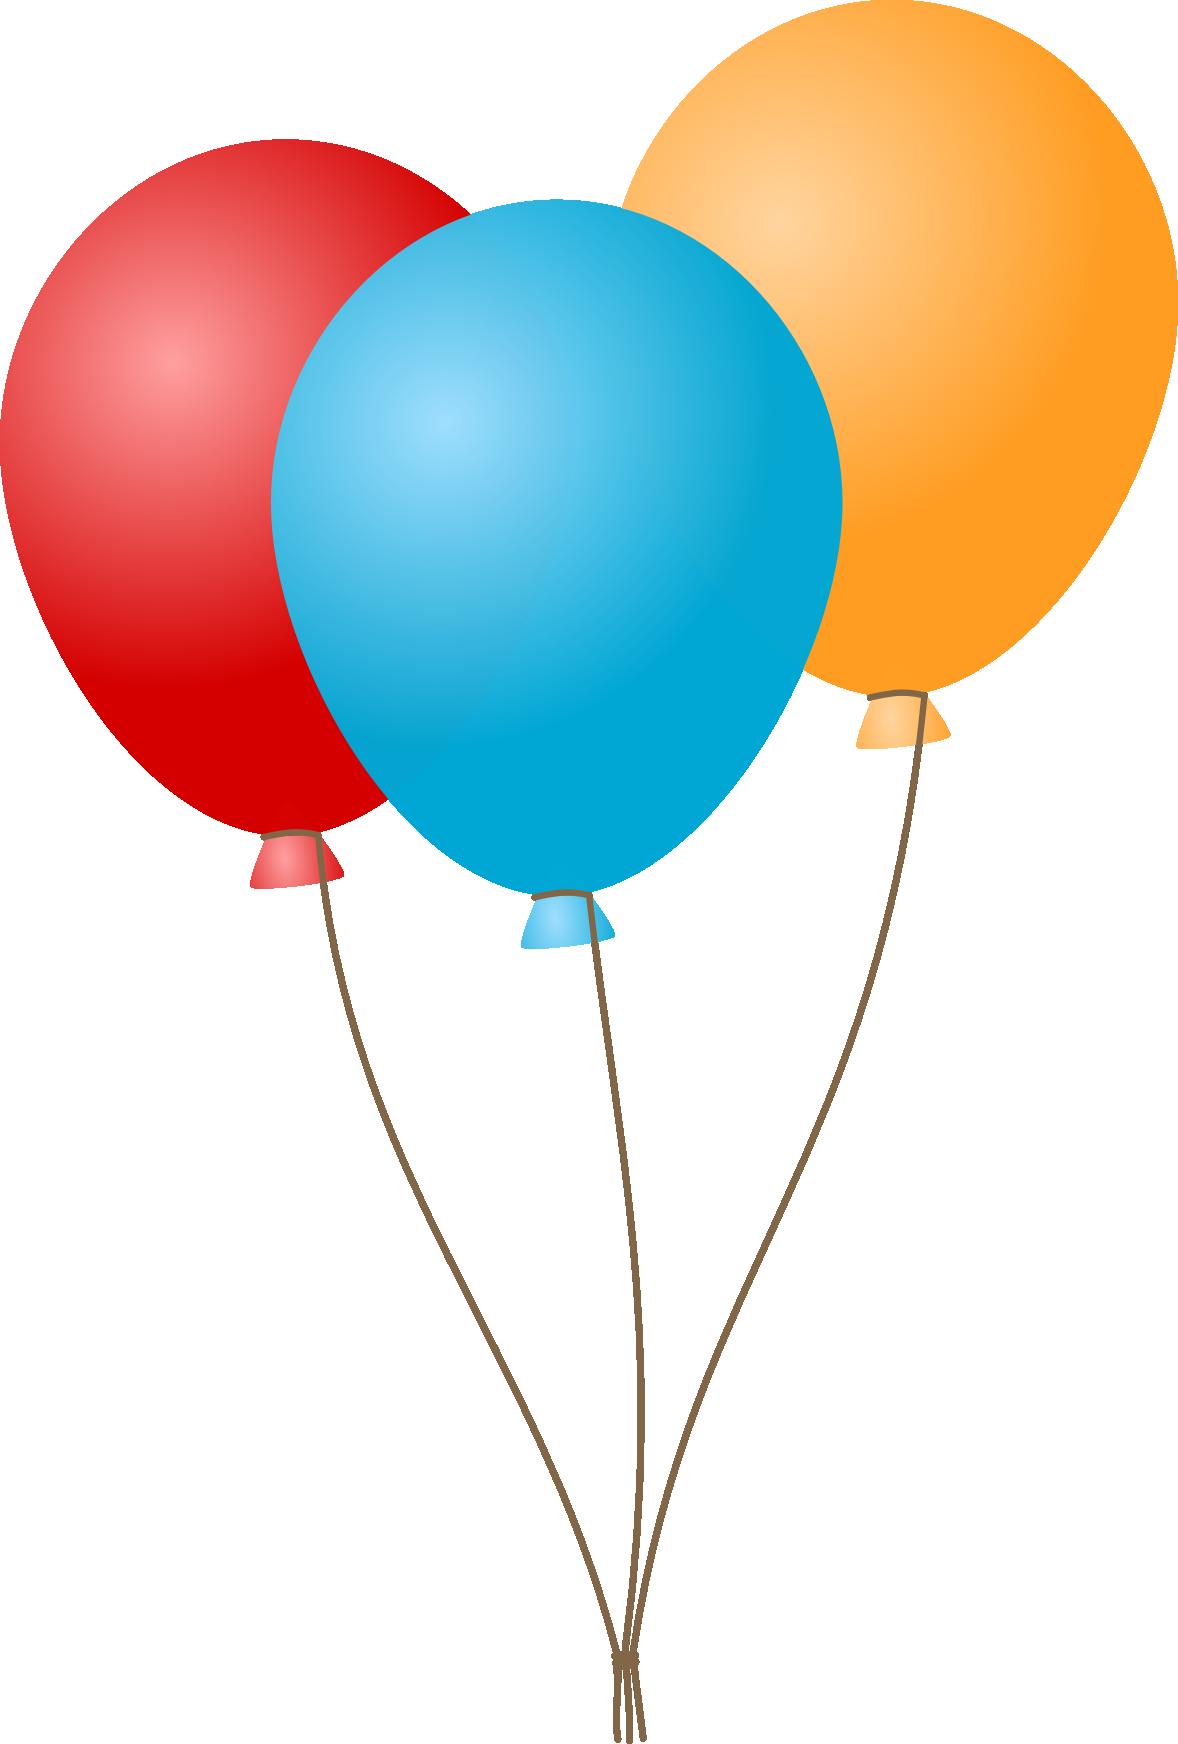 Balloons PNG HD - 121318